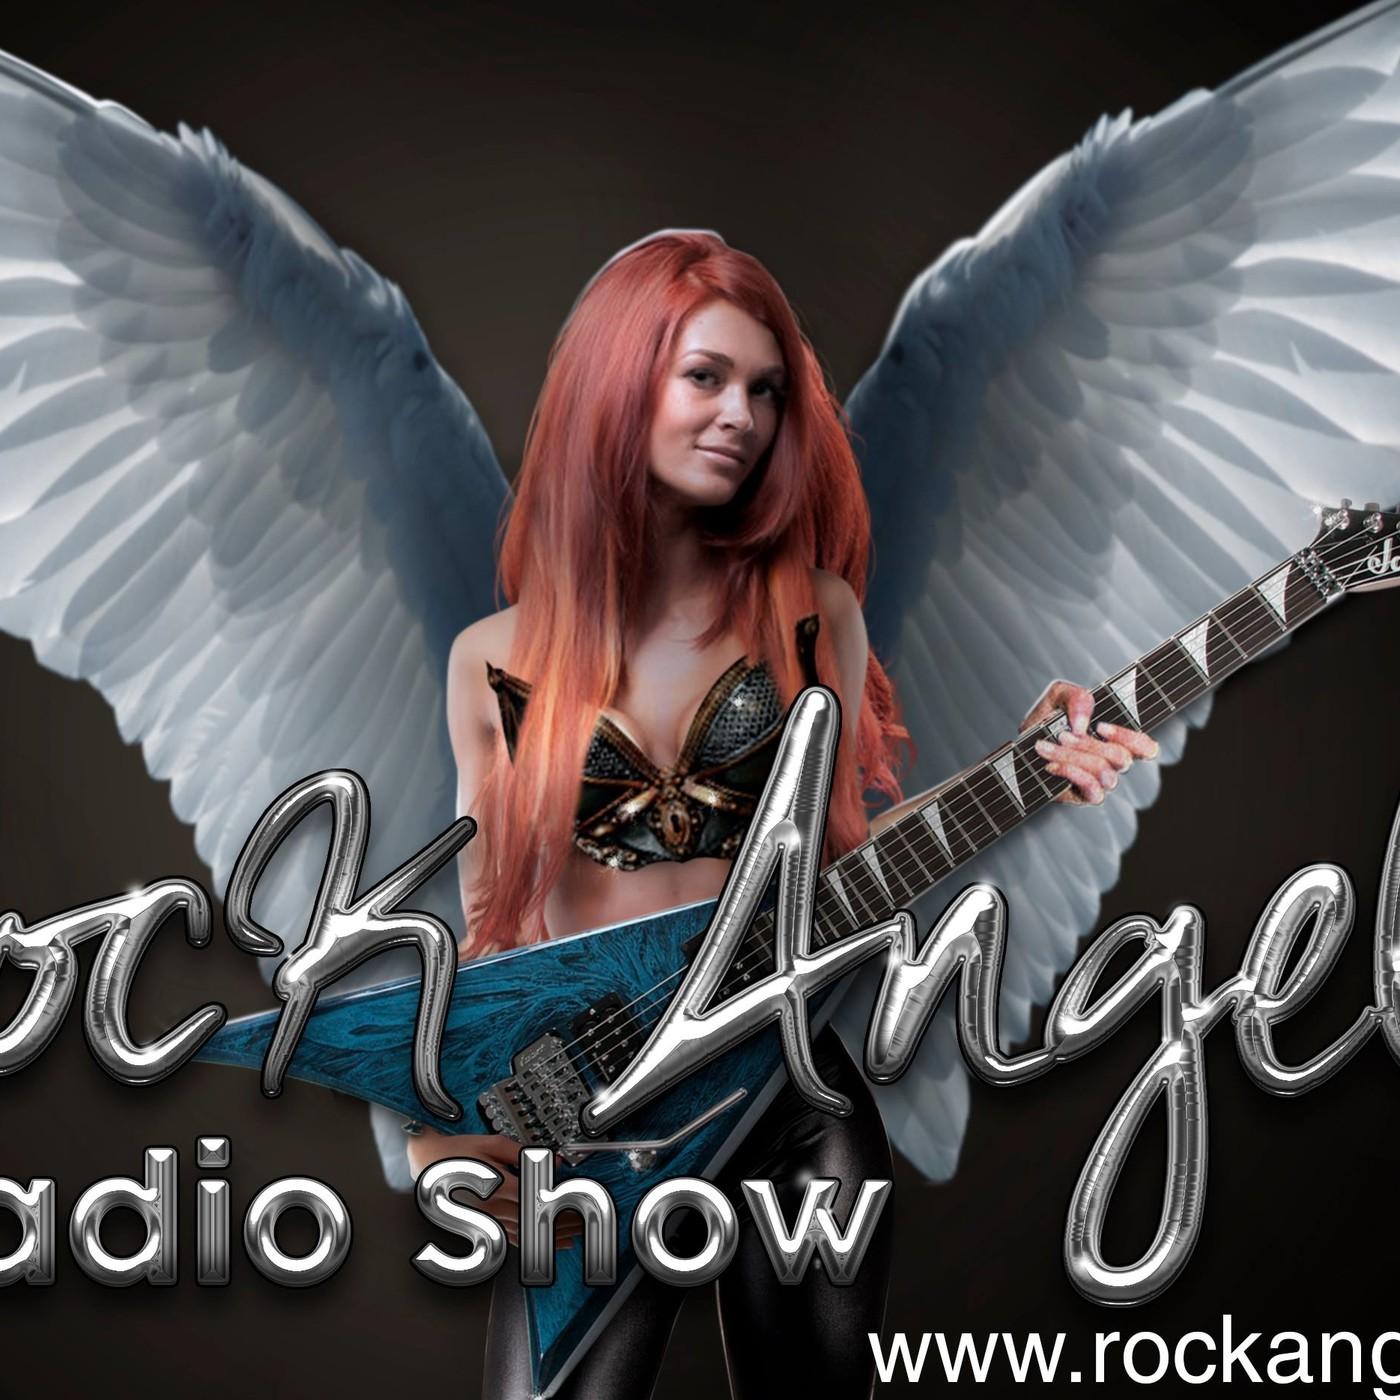 Rock Angels Radio Show Temporada 20/21 ESPECIAL EDDIE VAN HALEN PT IIPrograma 4: VH- The Hagar Years & other stuff!